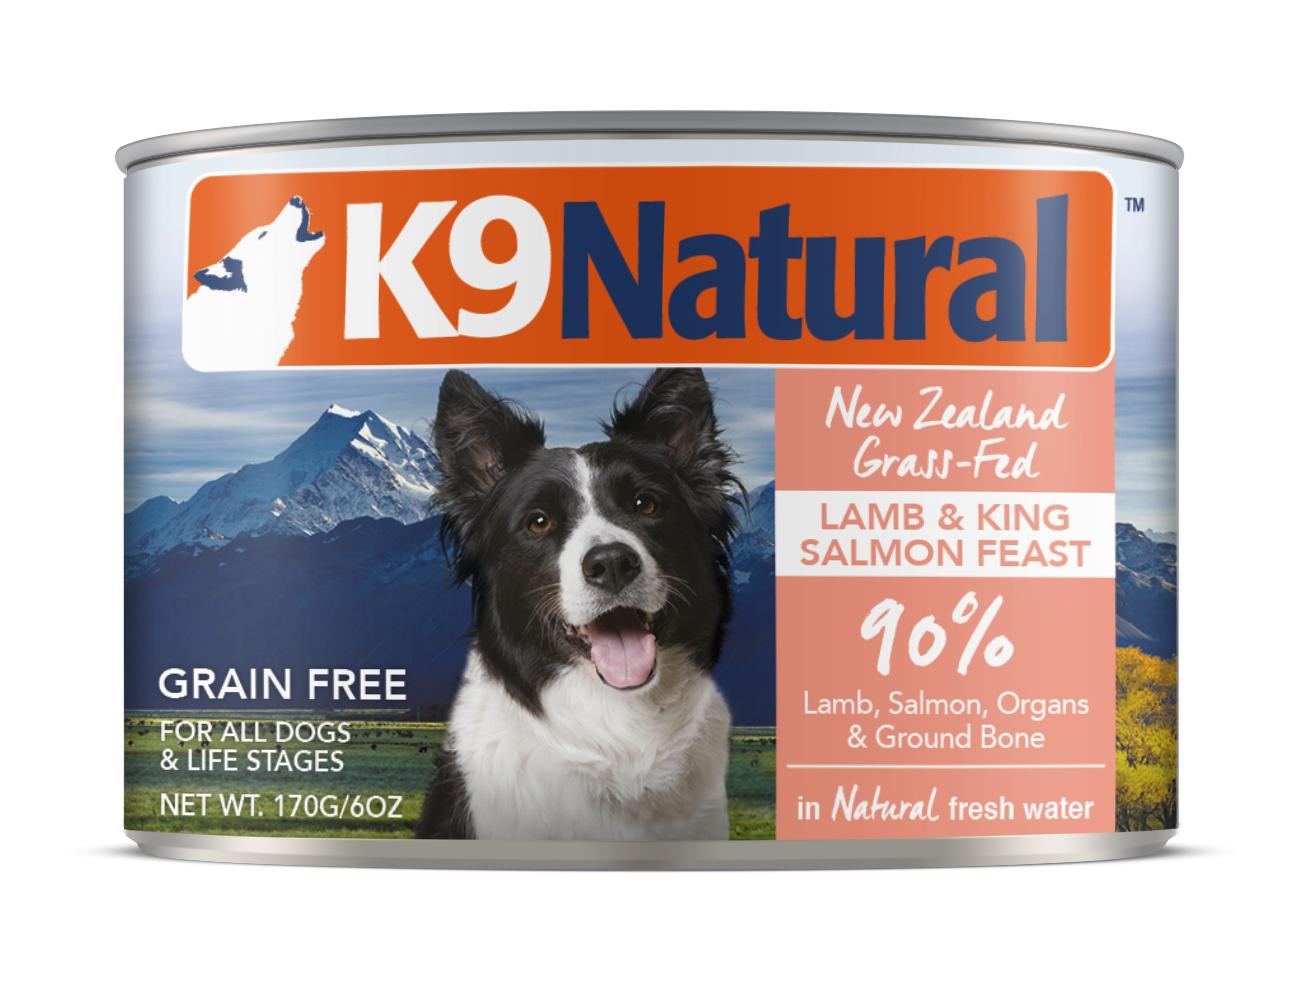 K9 Natural Lamb & Salmon Feast Grain-Free Wet Dog Food, 6-oz can